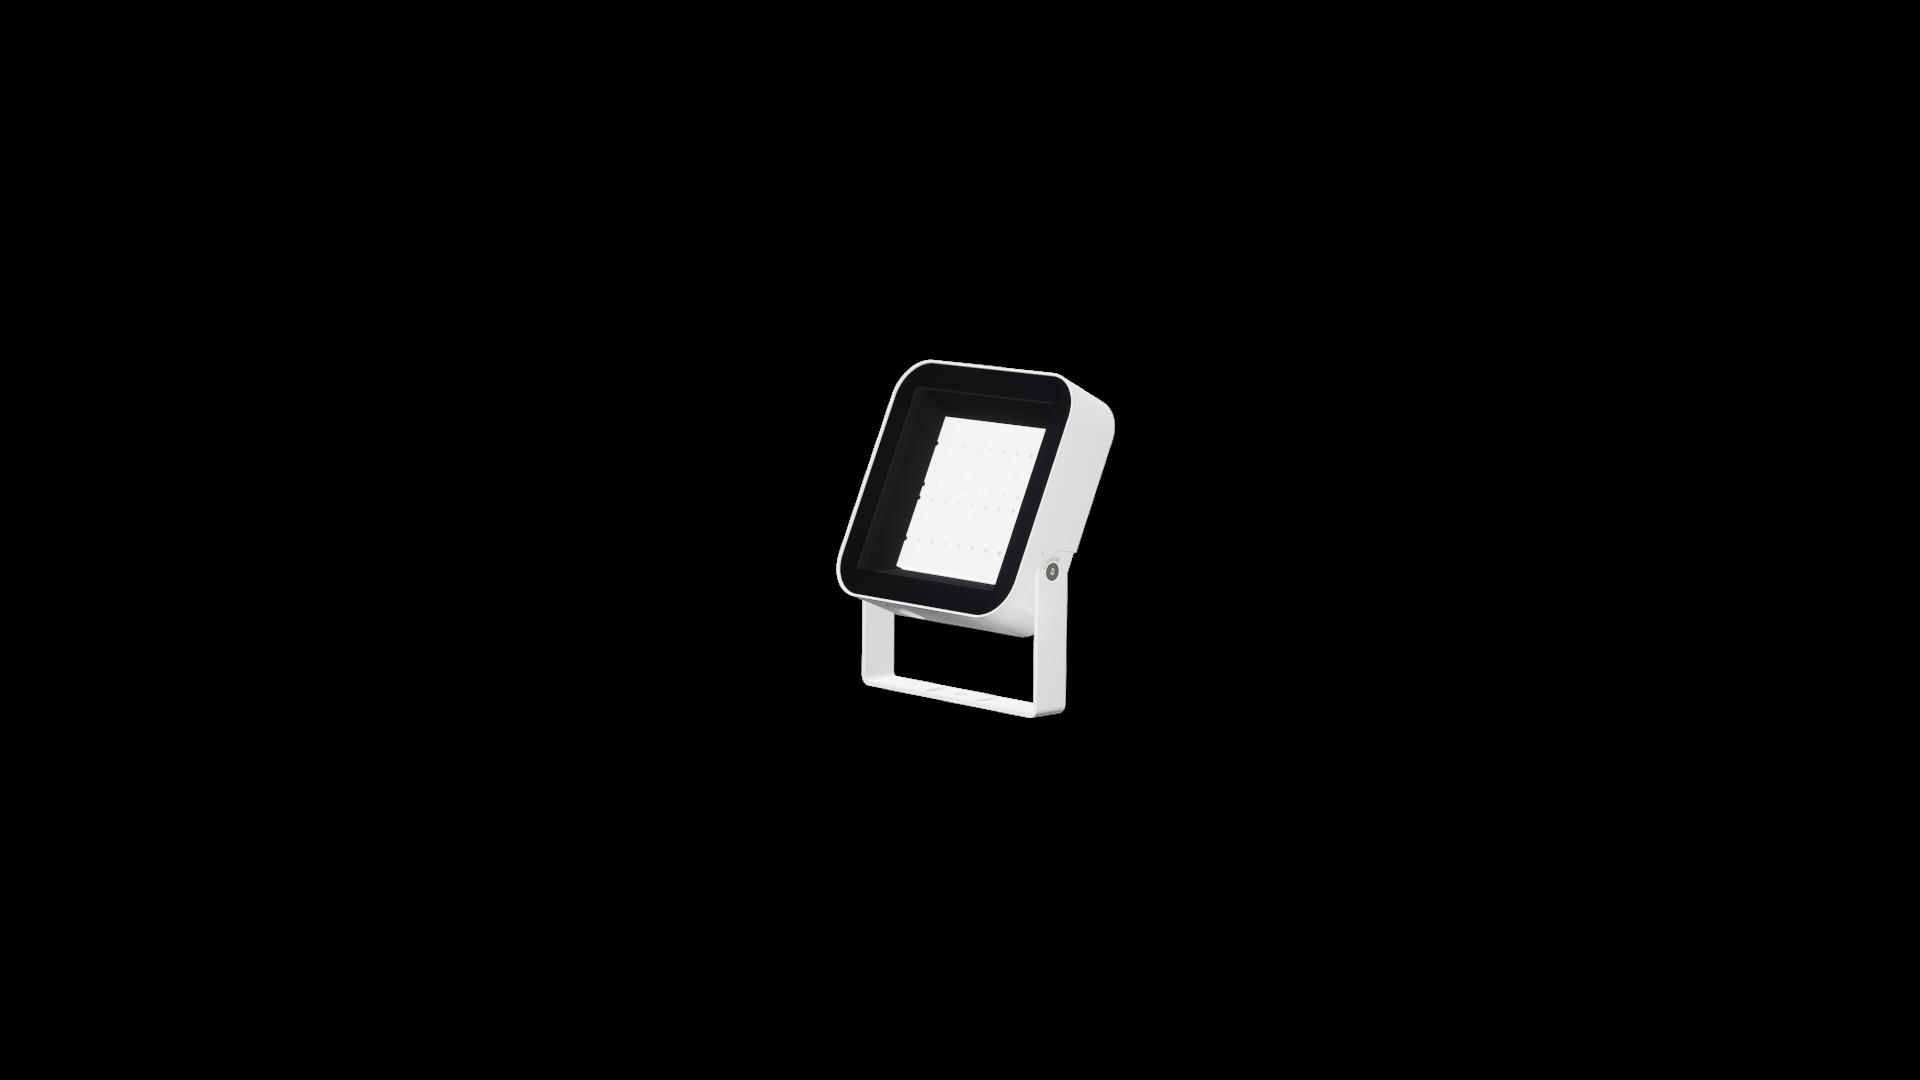 PHOCUX QL G40W TBLx11 XO con cierre transparente ReflectorNegro Blanco_HR_escala